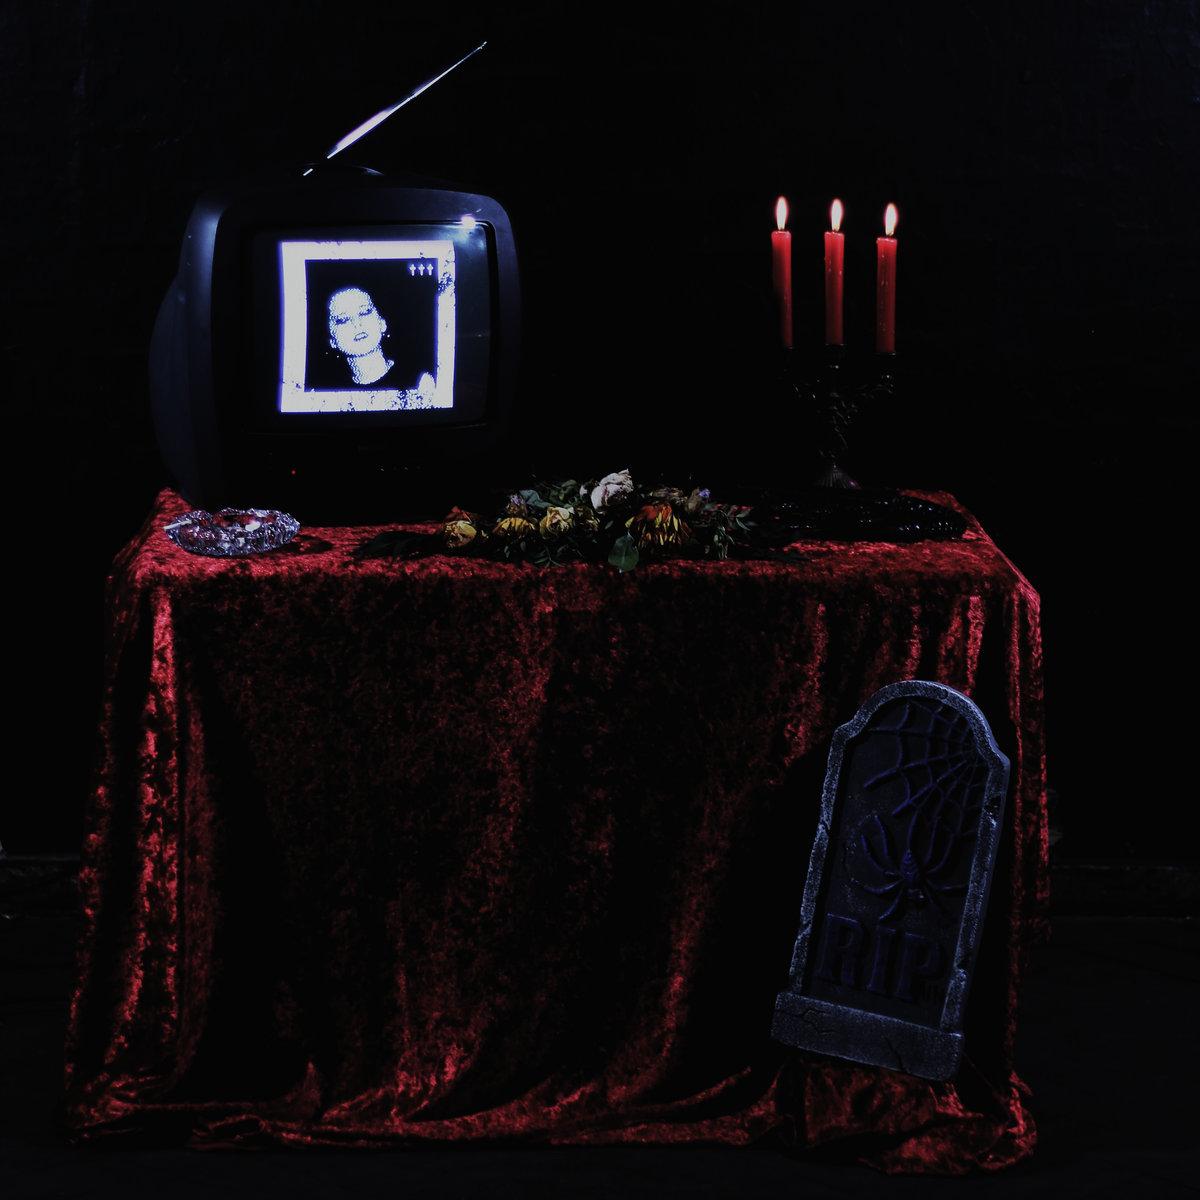 Baical - Euphoria (EP; 2017)